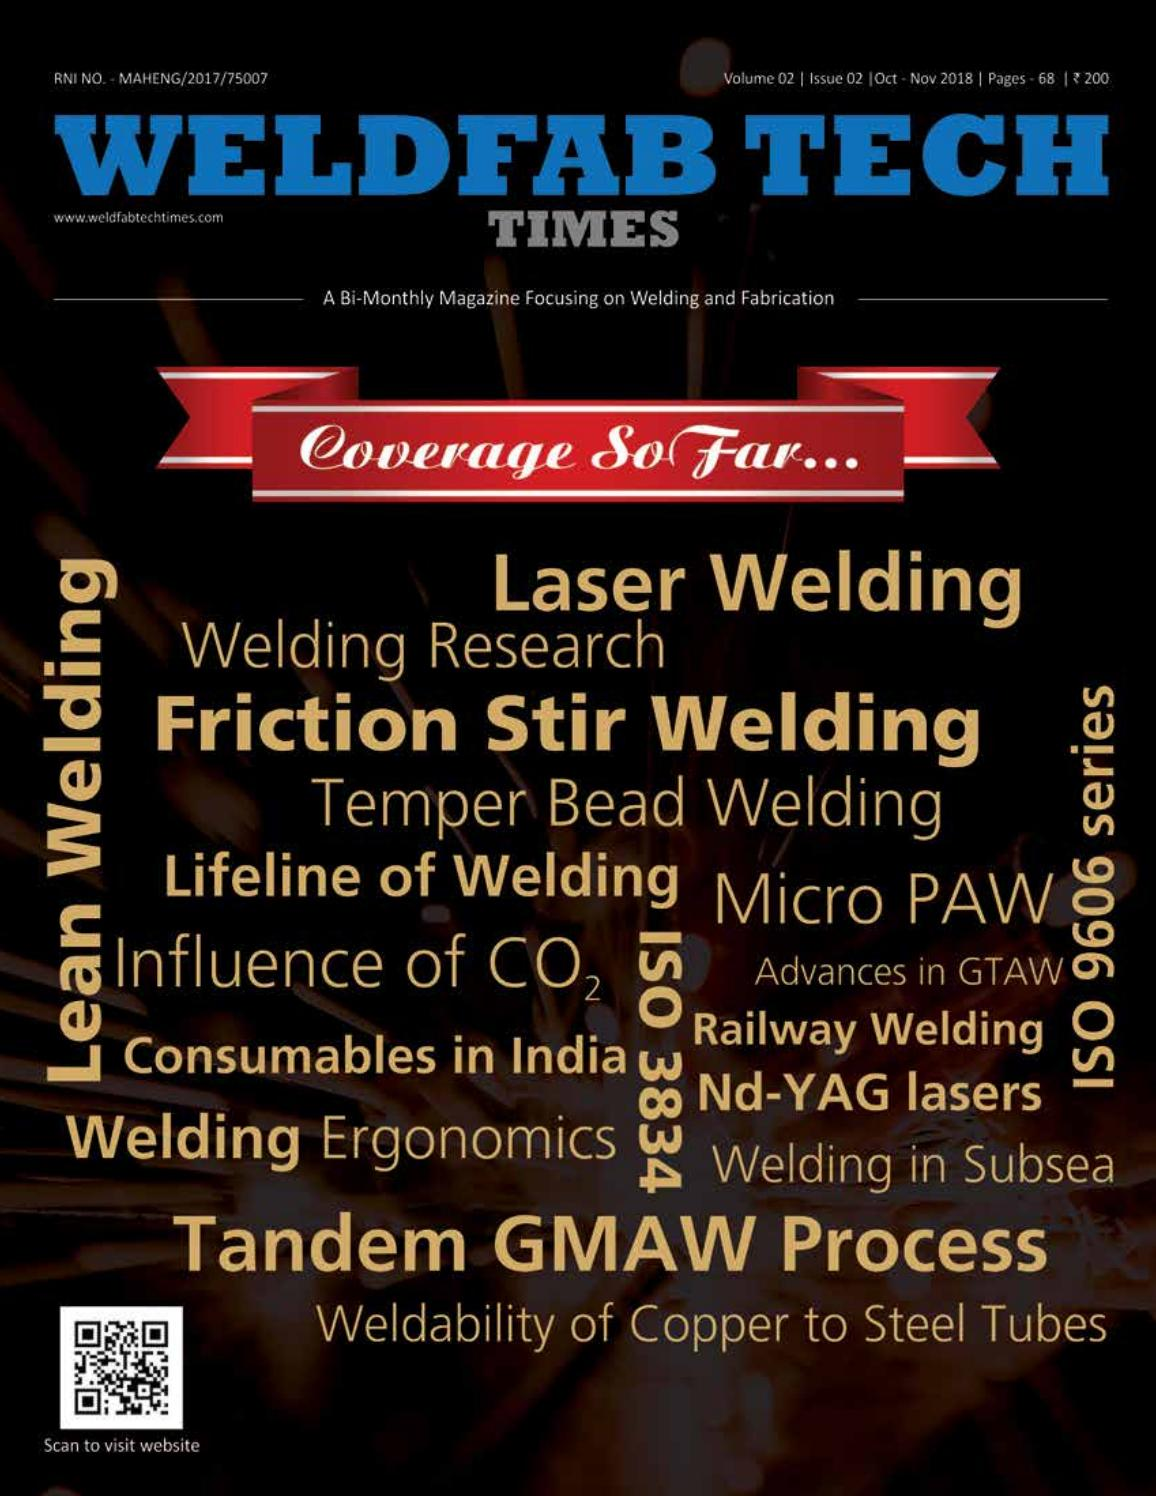 hight resolution of weldfab tech times oct nov 2018